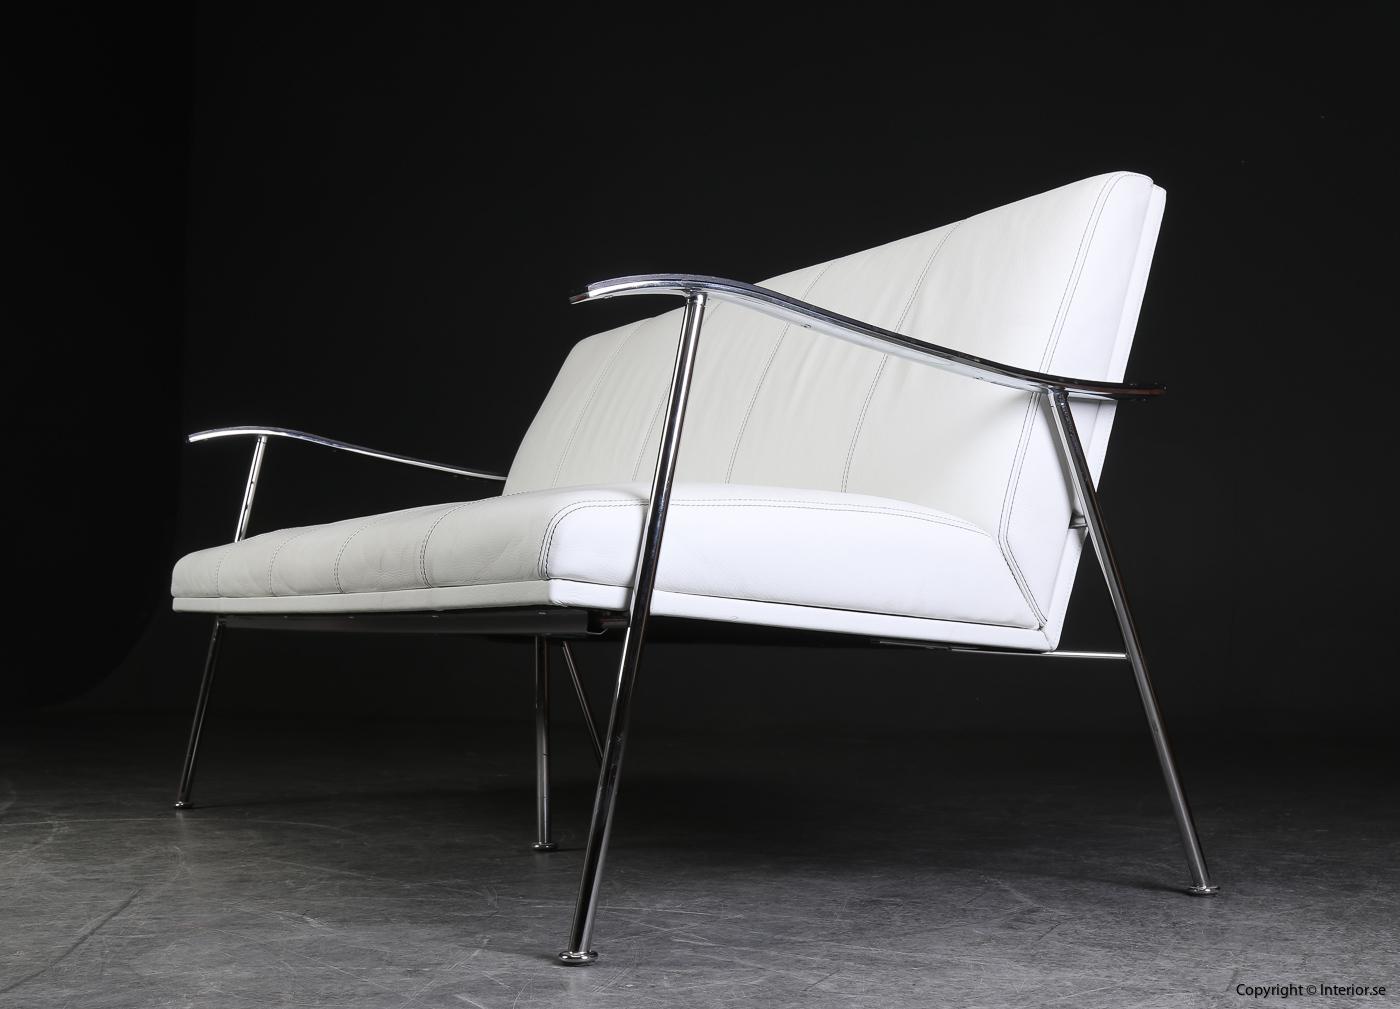 Soffgrupp armchair sofa, Lammhults Sahara i skinn - Gunilla Allard 6